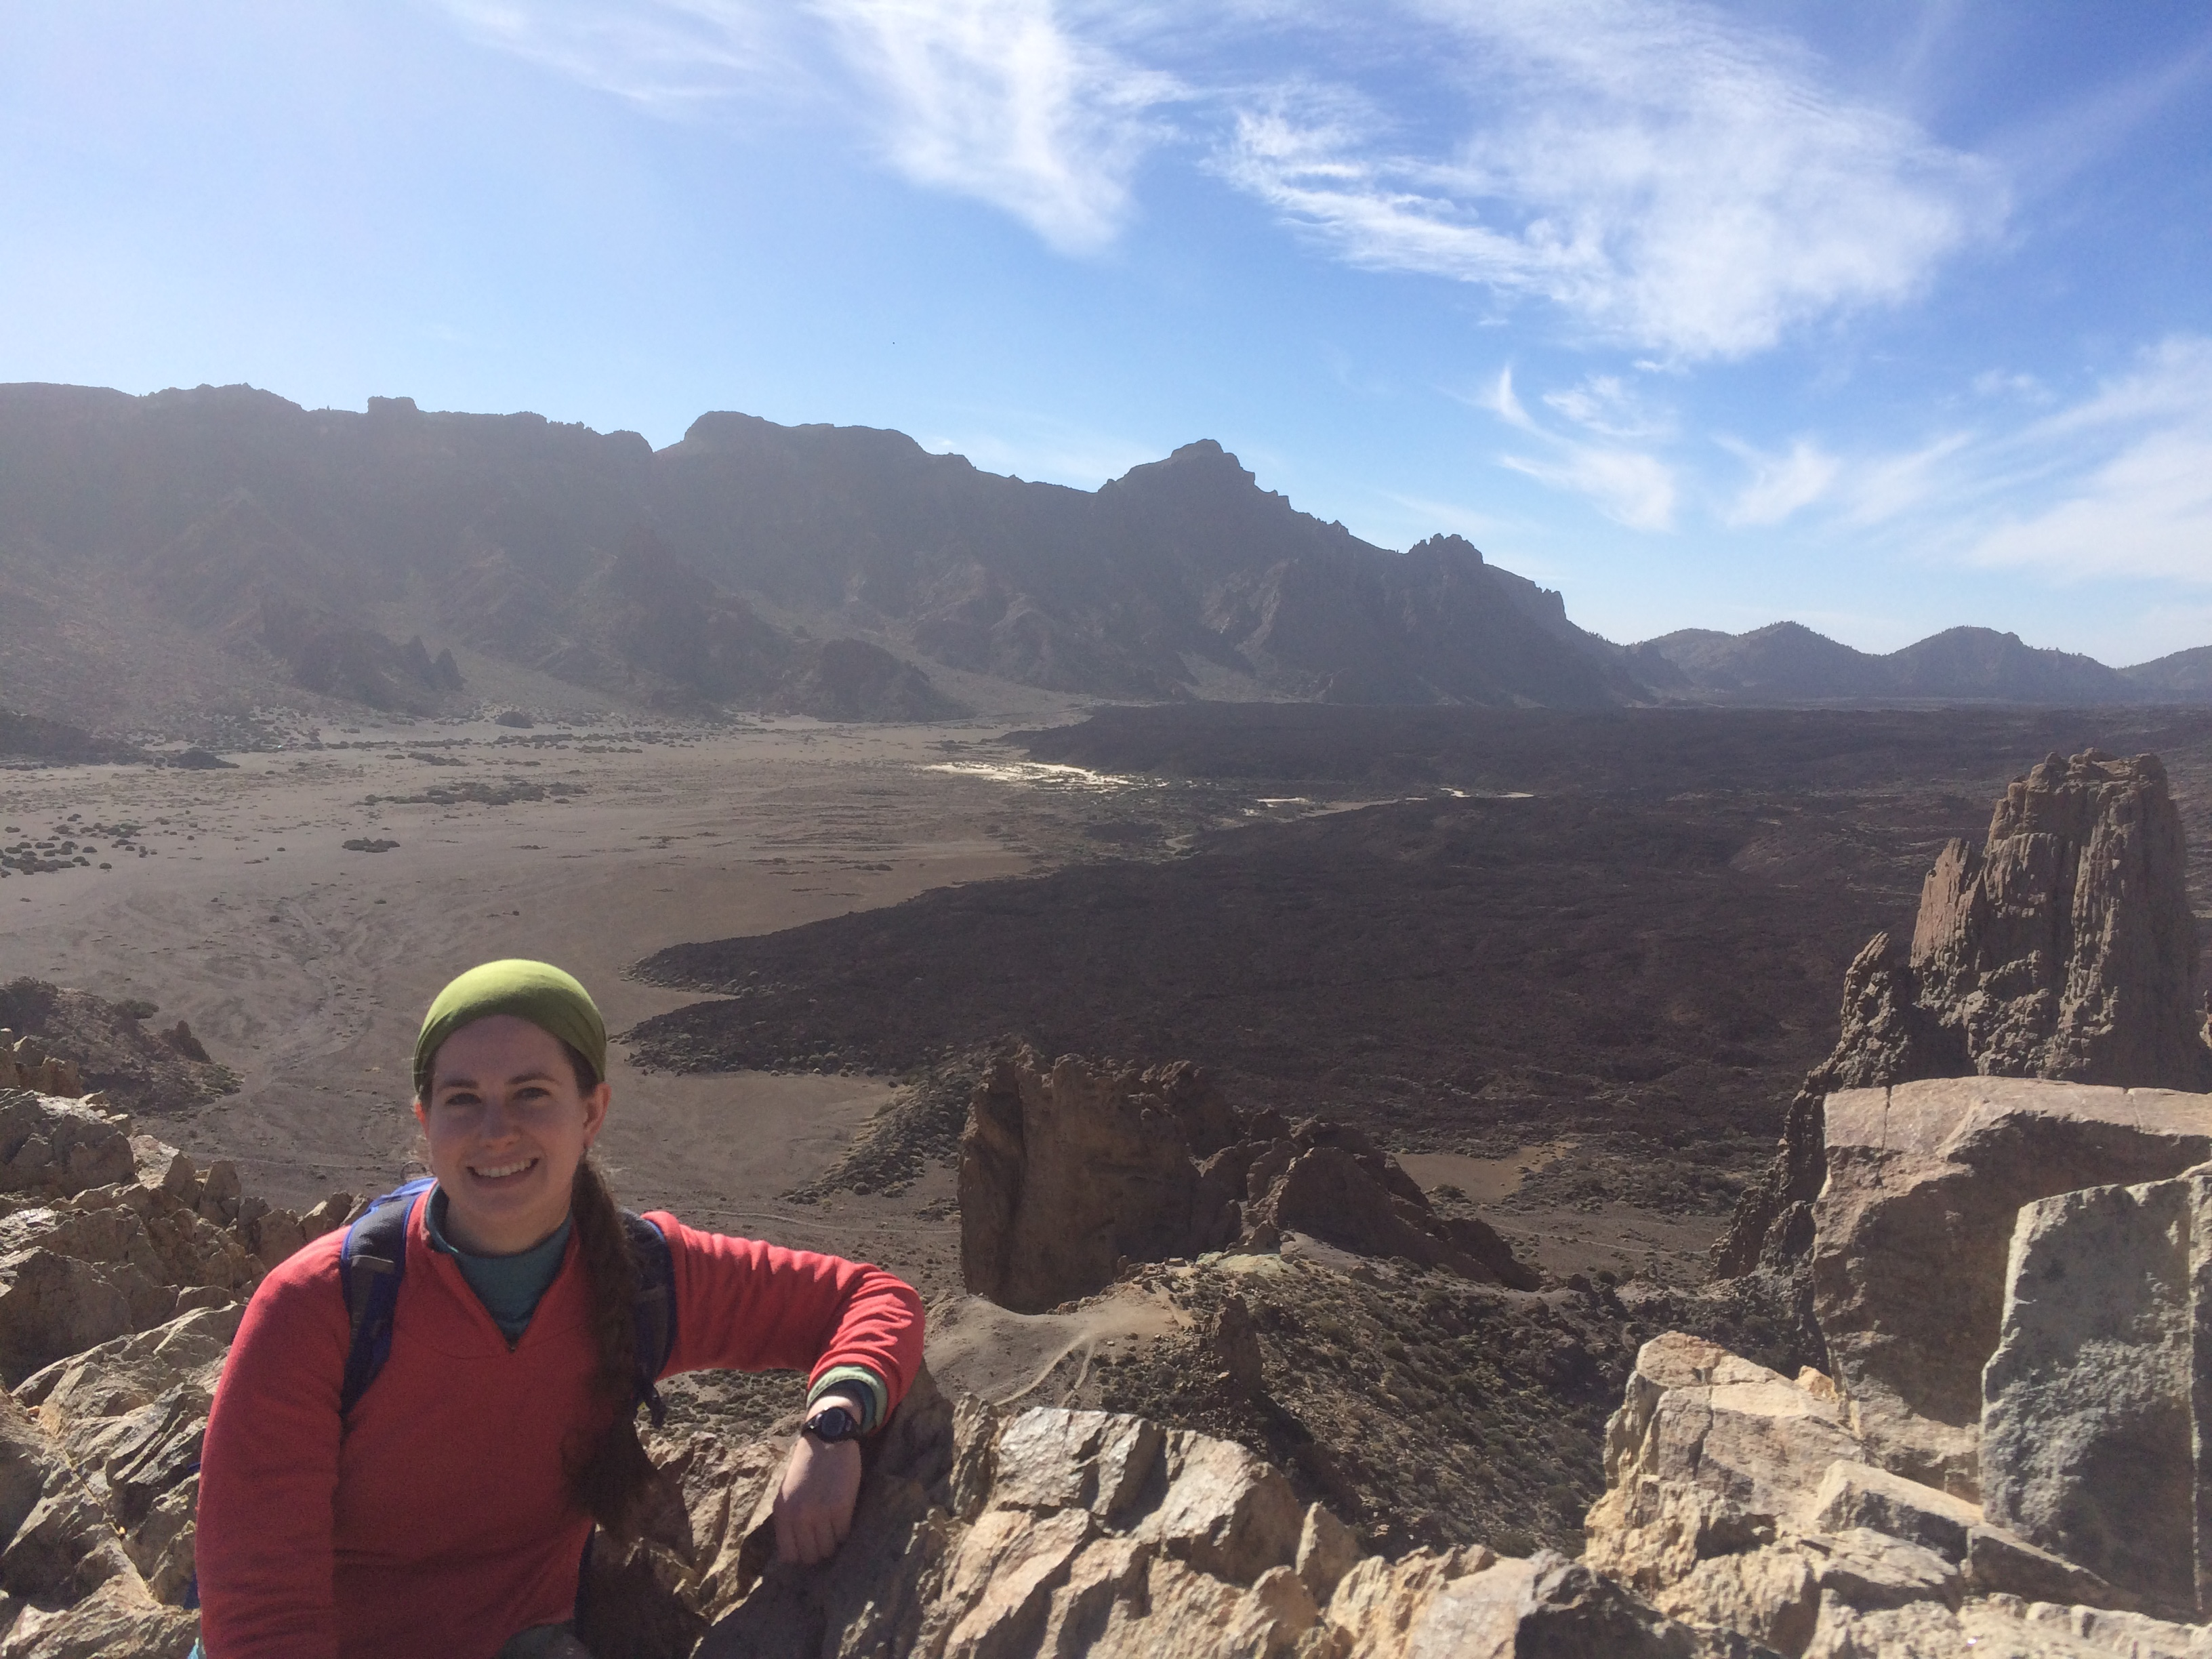 Patricia at Teide Volcano